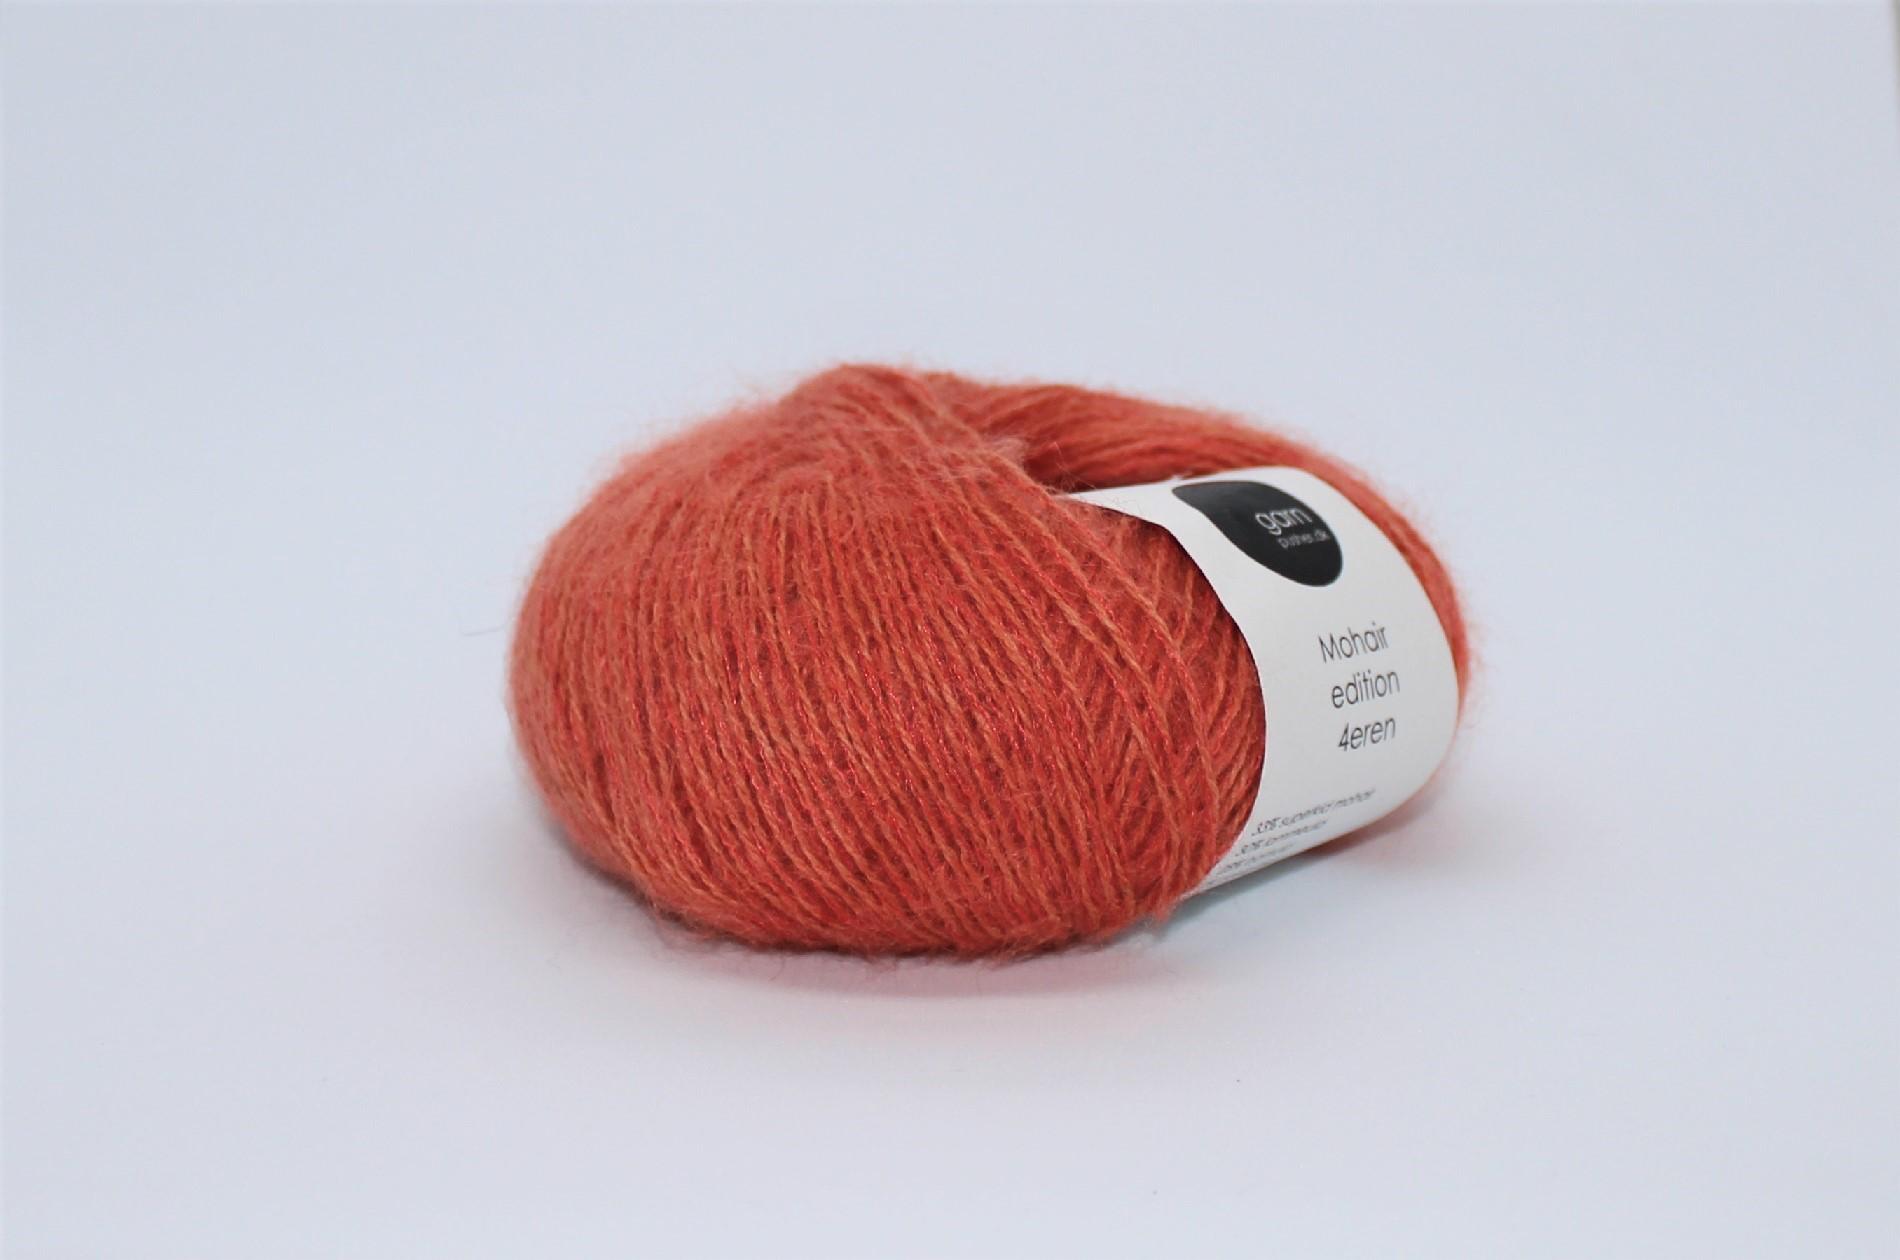 Mohair edition 4eren orange